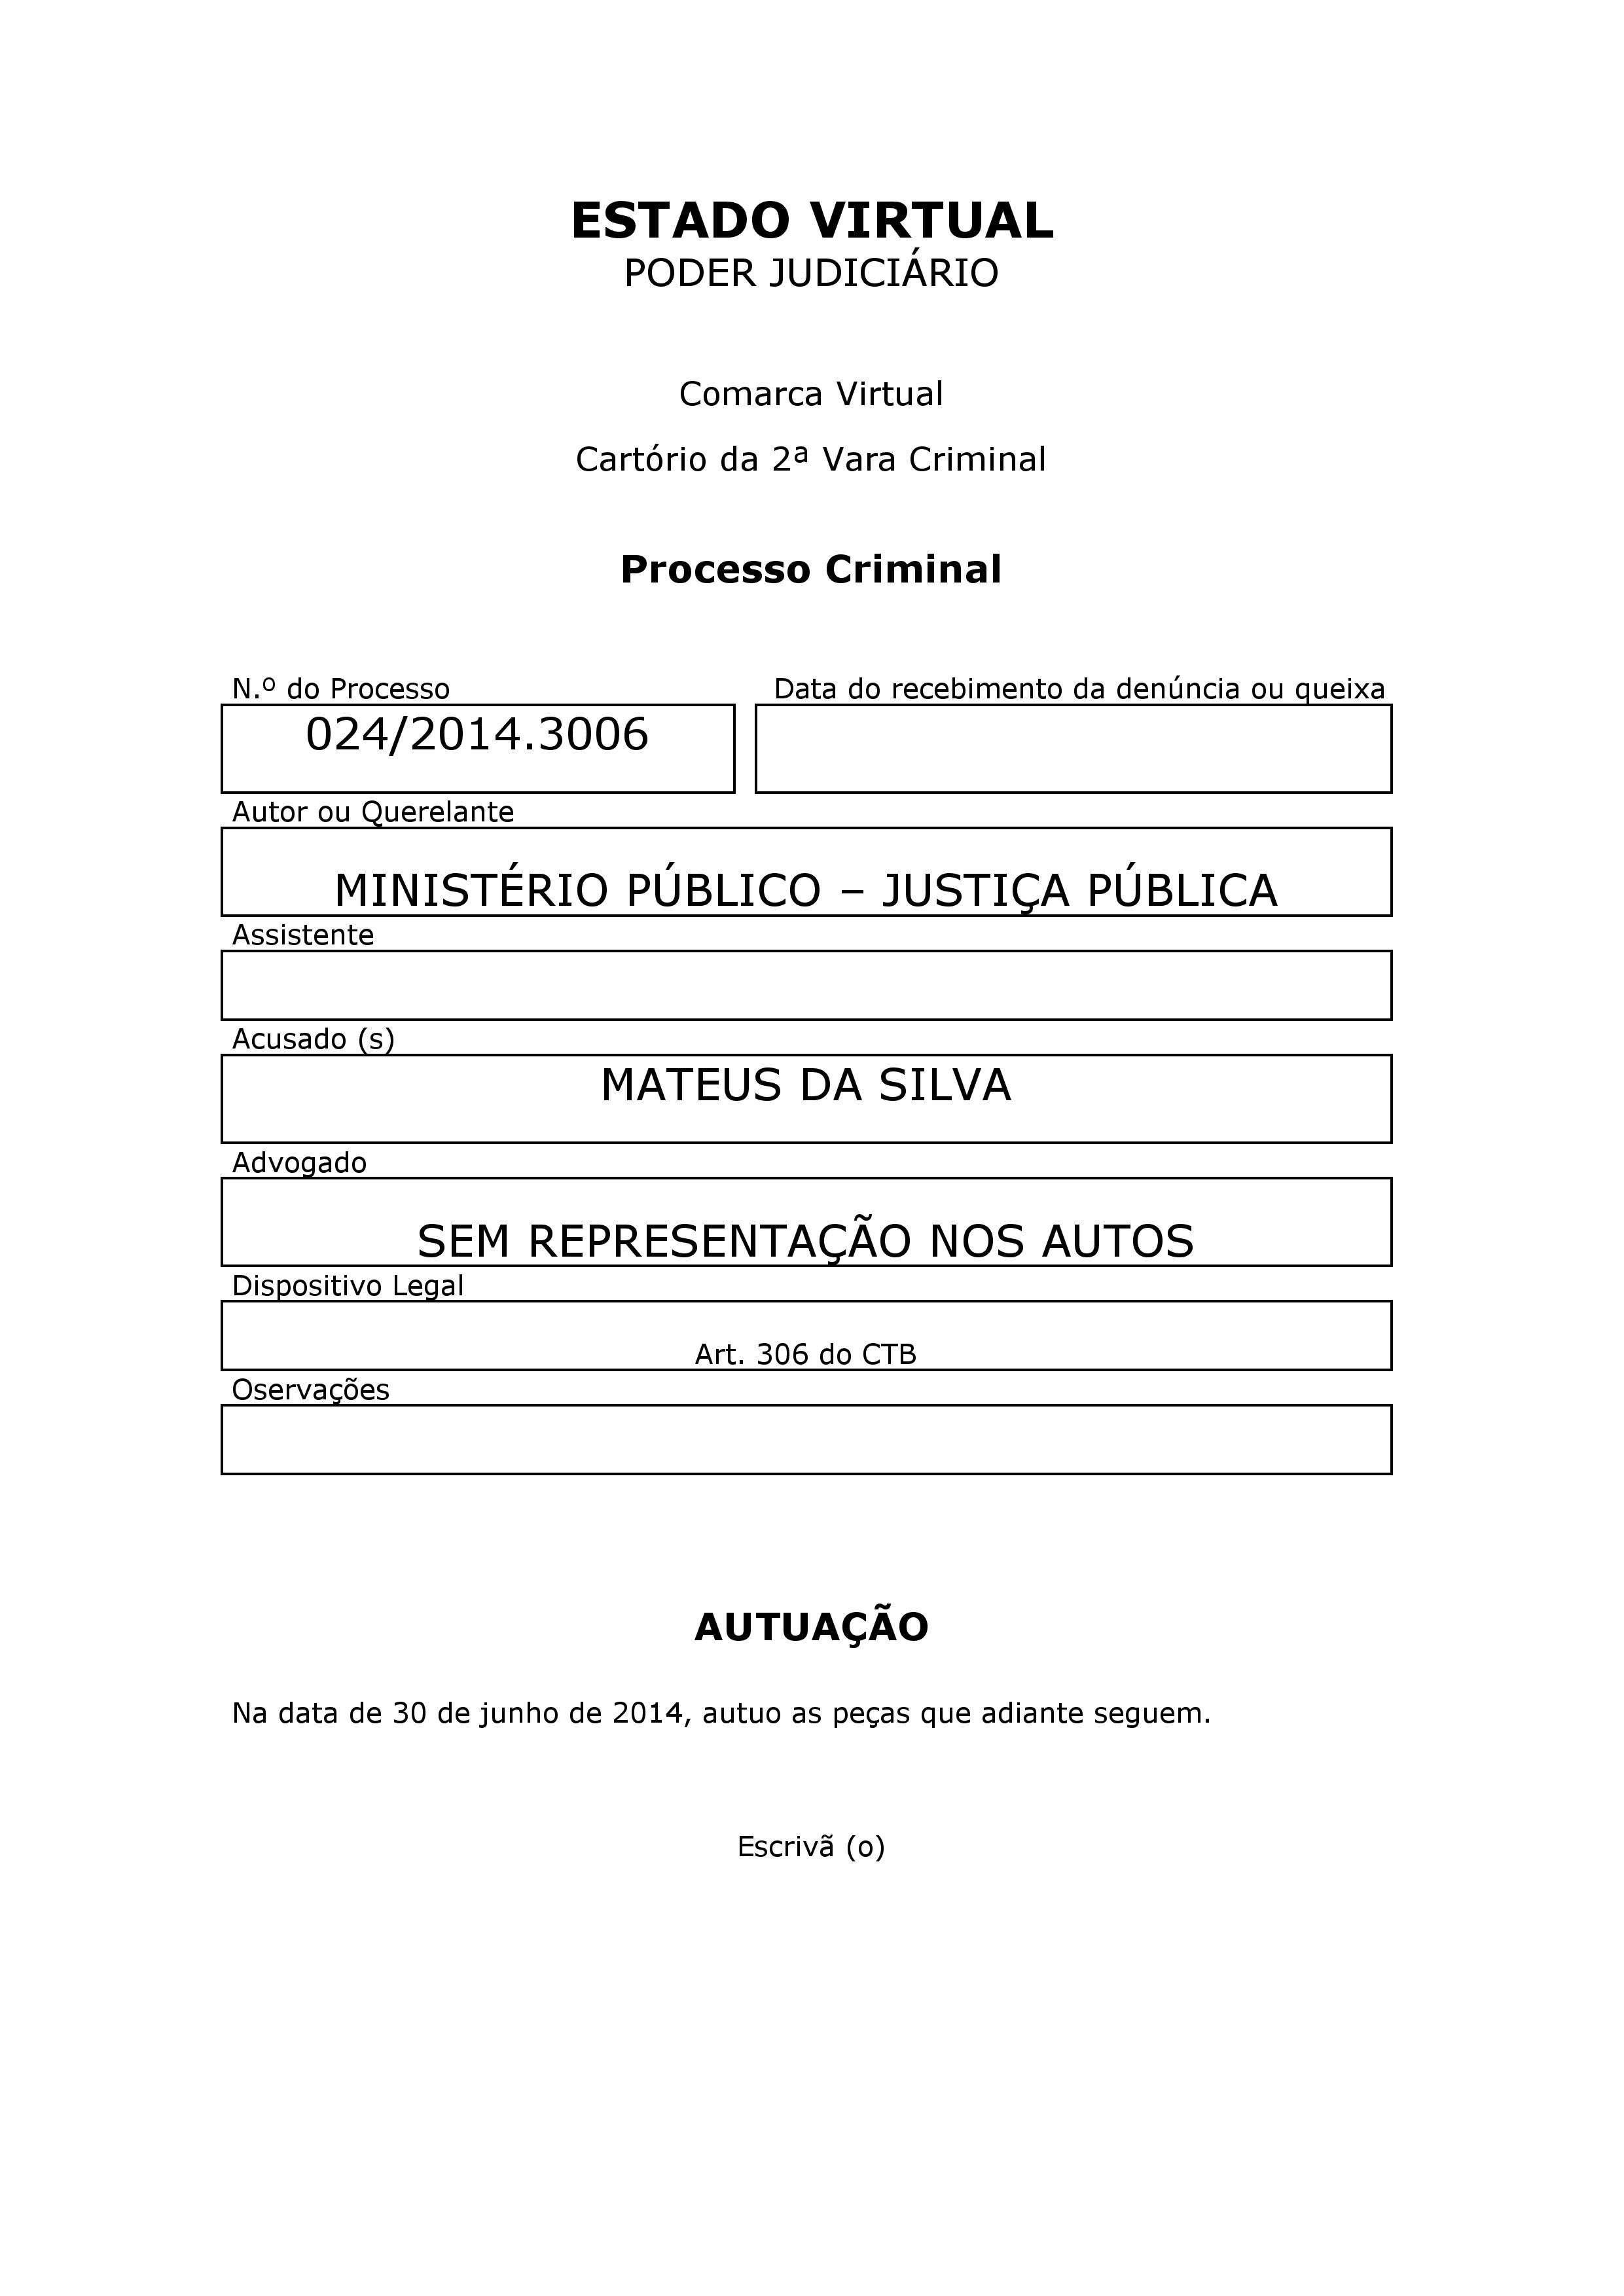 Processo nº 024/2014.3006 Capa_c11